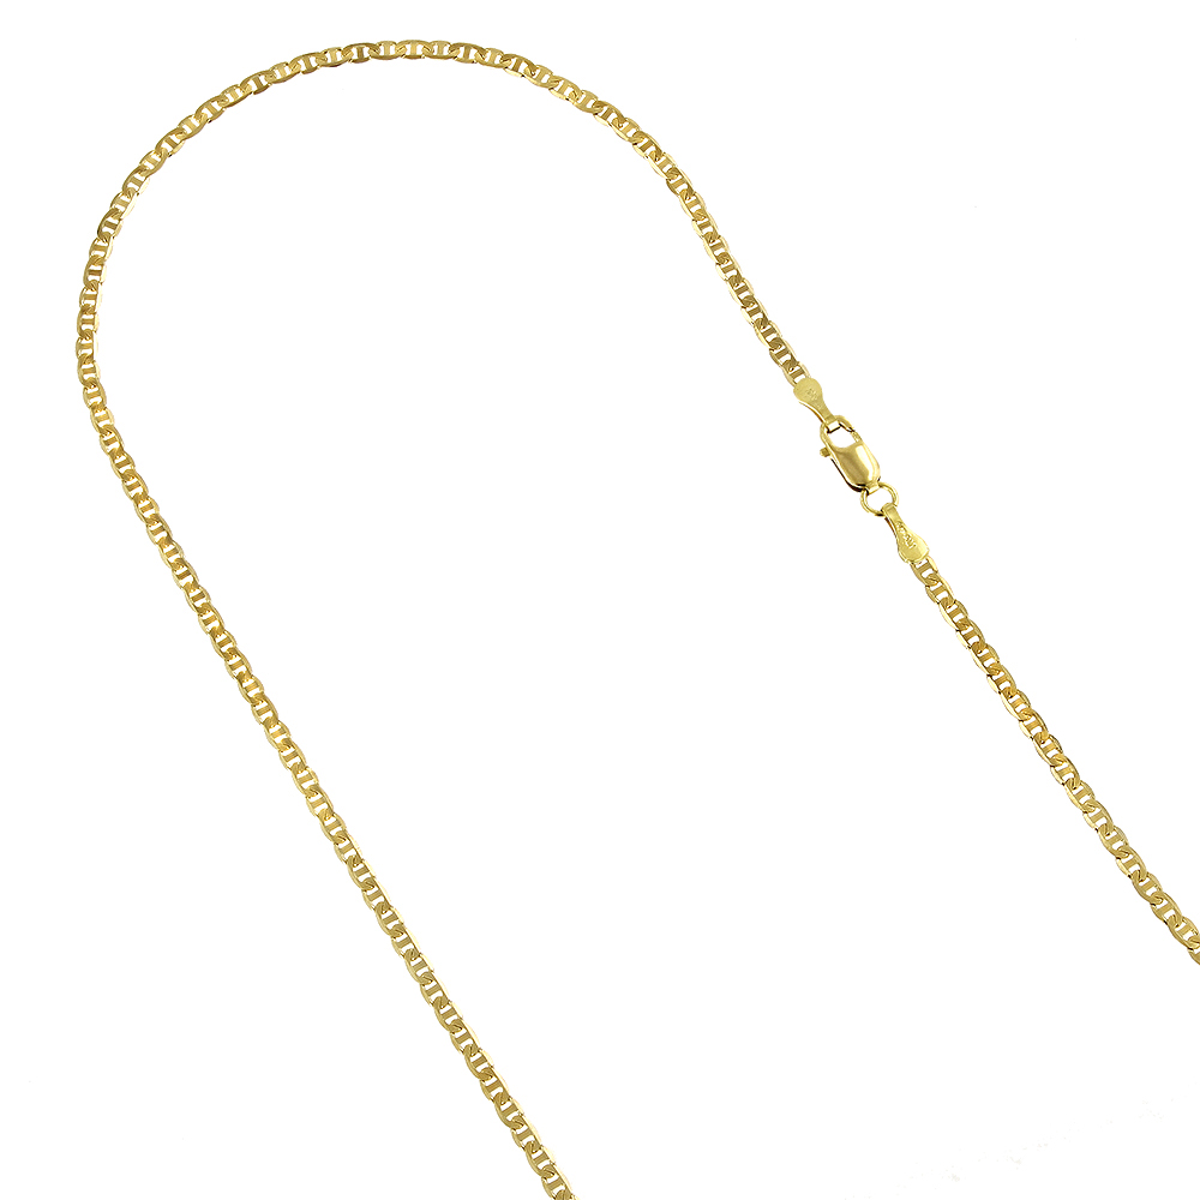 LUXURMAN Solid 10k Gold Mariner Chain For Men & Women 1.7mm Wide